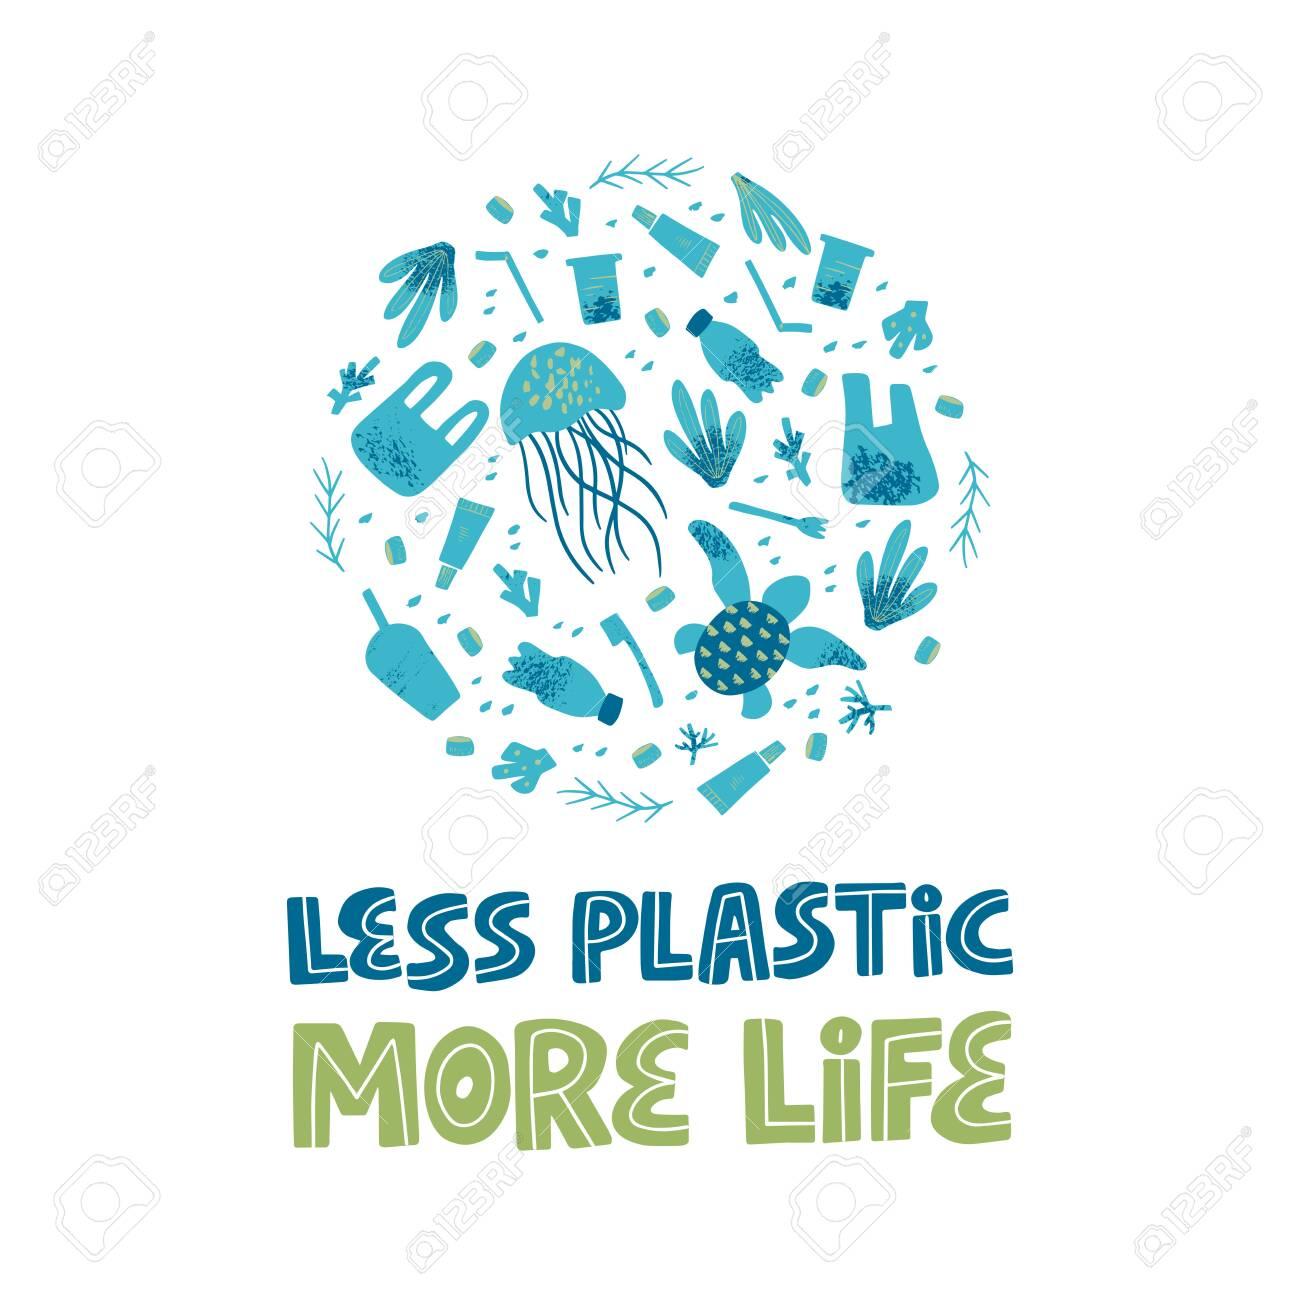 zero waste and plastic free lifestyle slogan waste contamination